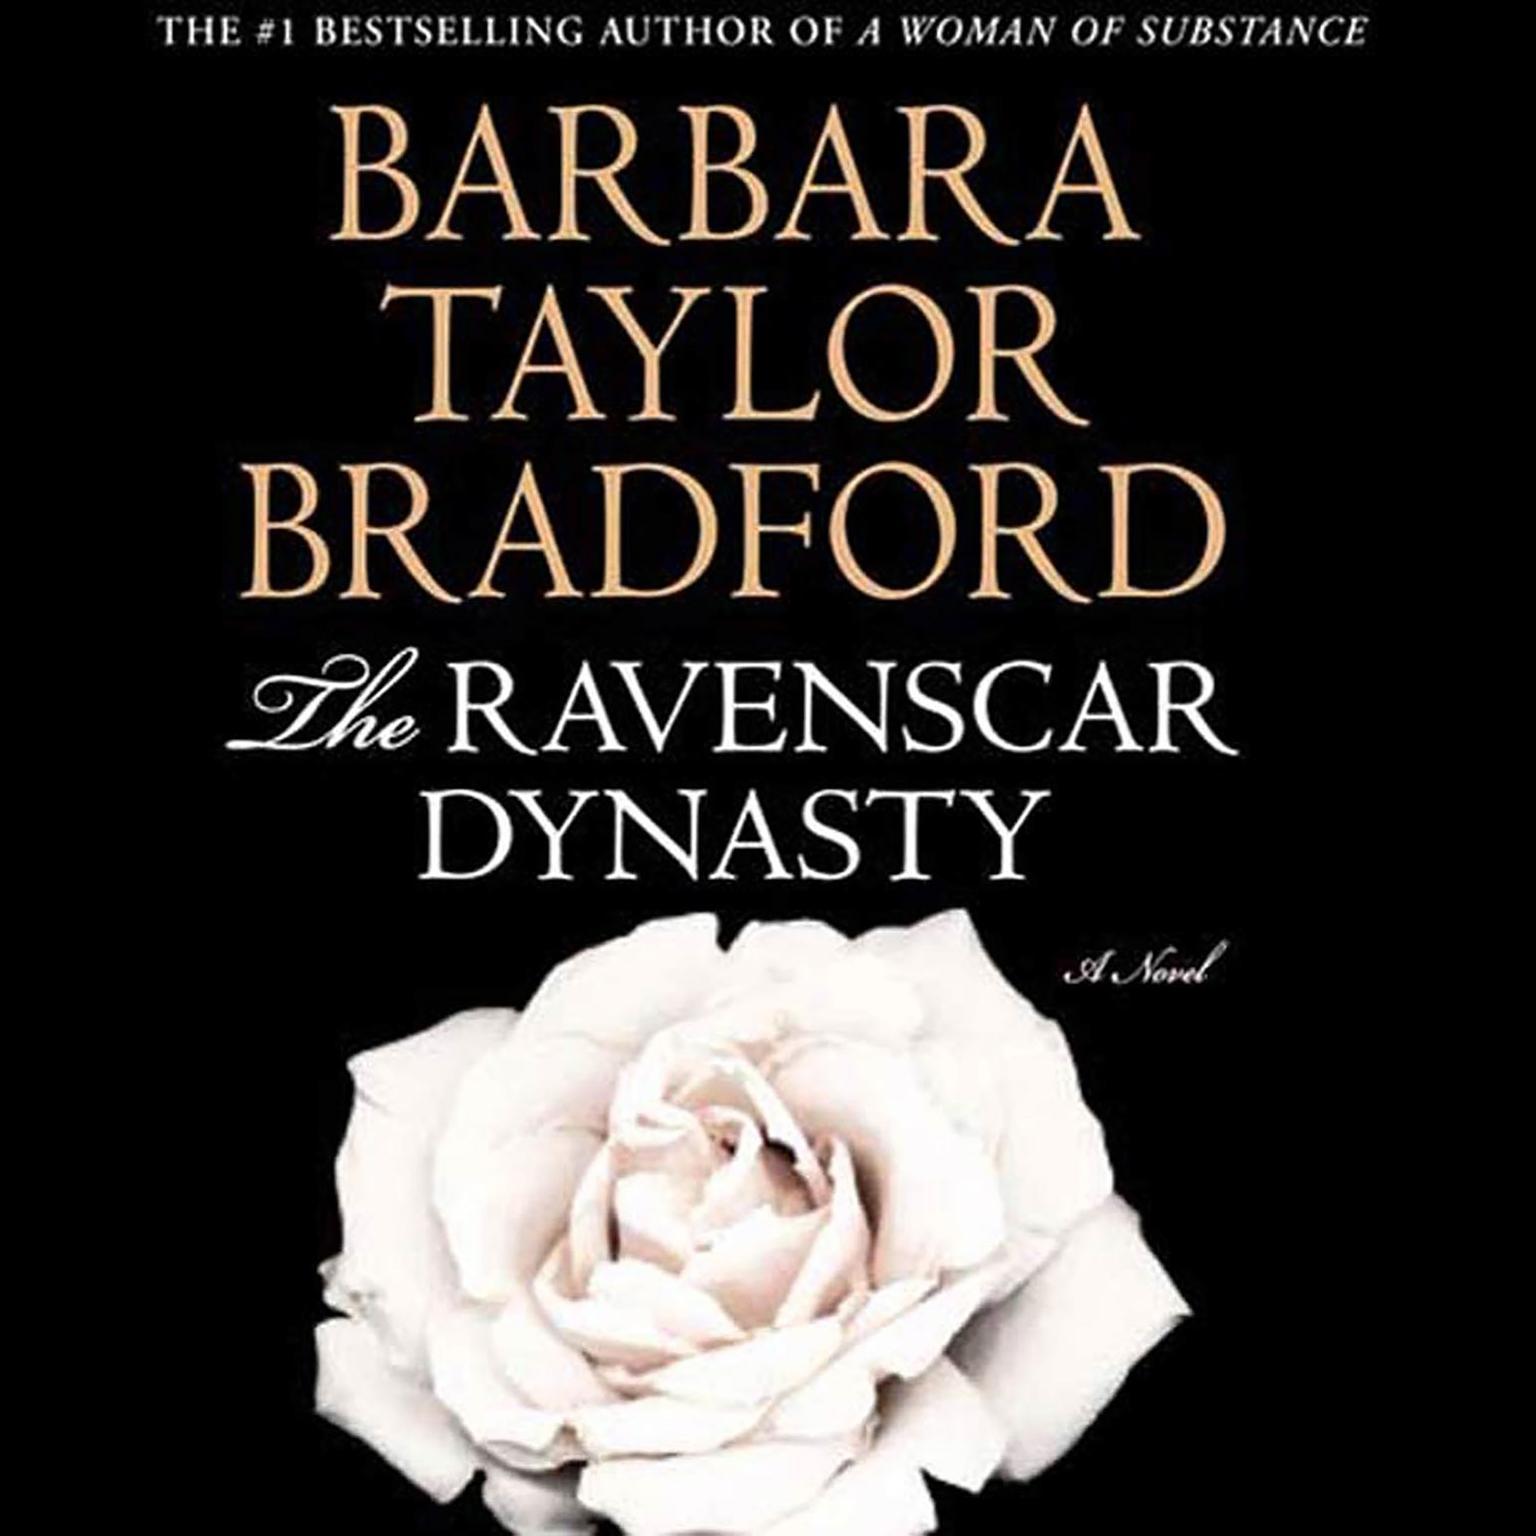 The Ravenscar Dynasty (Abridged): A Novel Audiobook, by Barbara Taylor Bradford